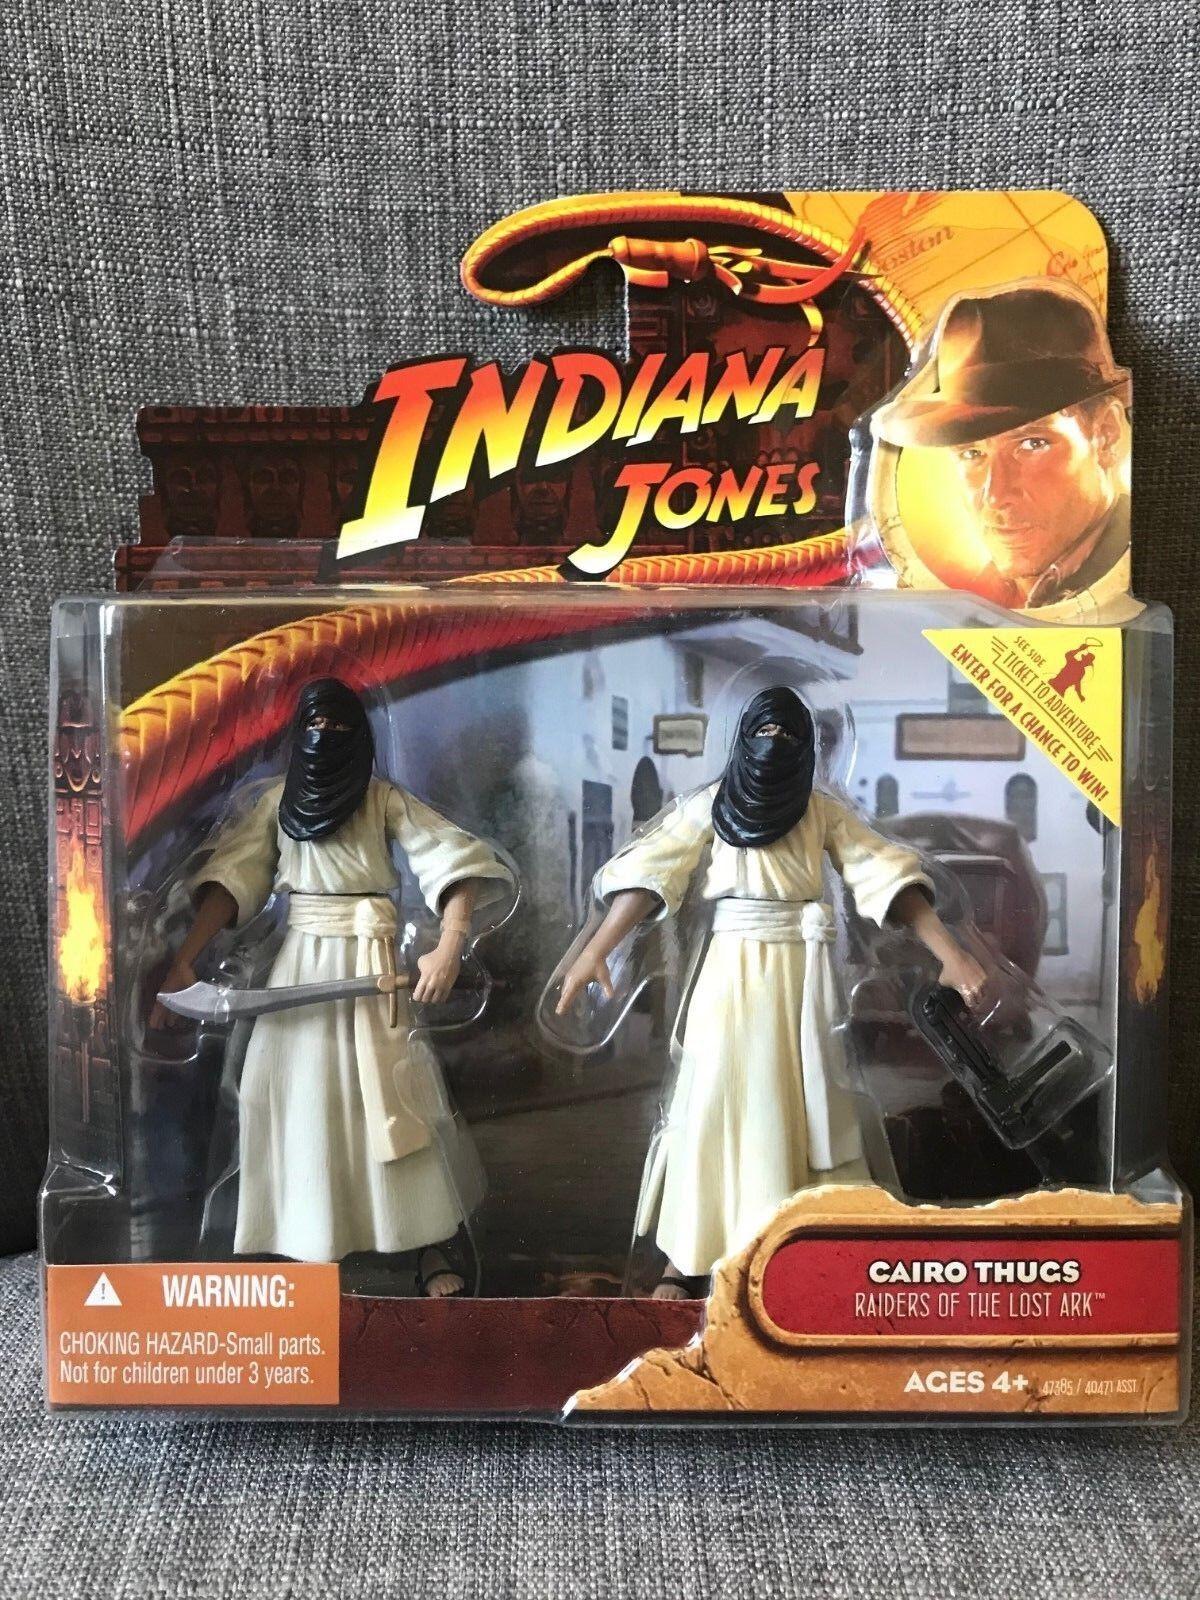 Indiana Jones Cairo Thugs Raiders of the Lost Ark 2008 New   Sealed Box